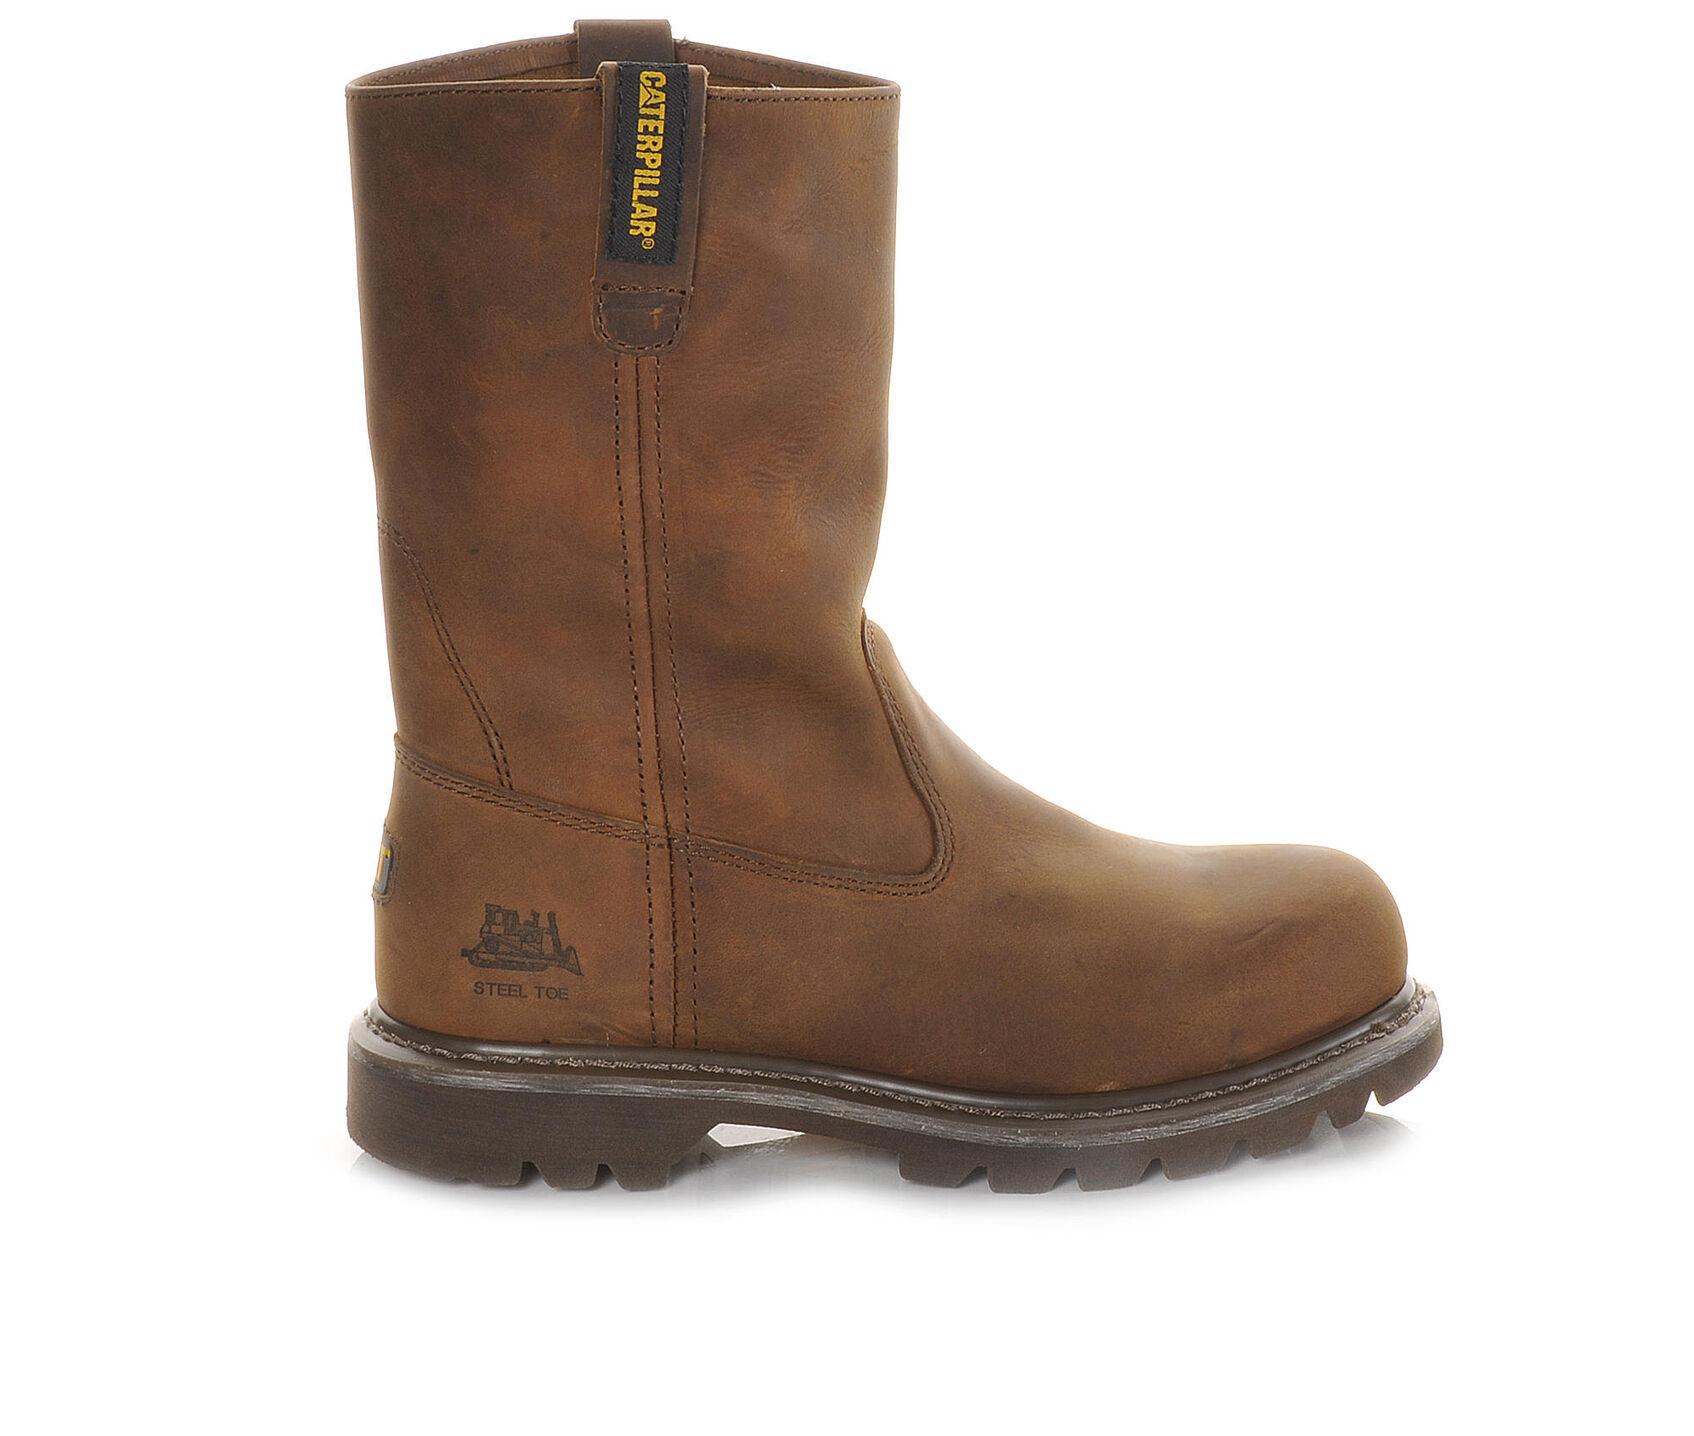 Women s Caterpillar Revolver Steel Toe - Ladies Work Boots  28b8f018f9